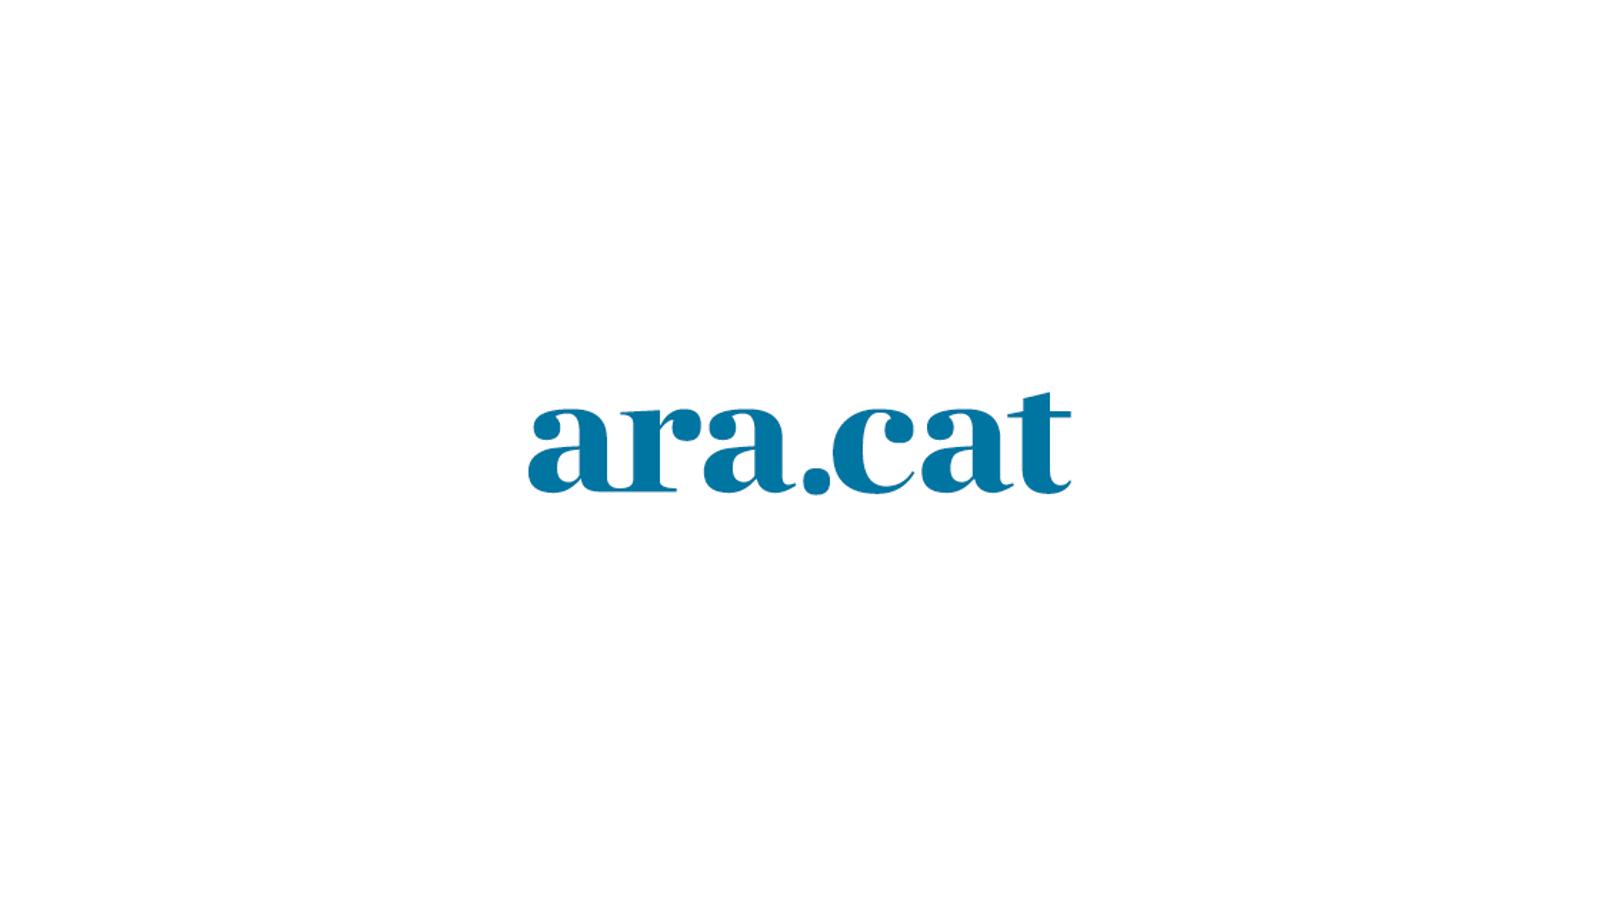 Card-Twitter-aracat_2273782769_64339014_1200x630